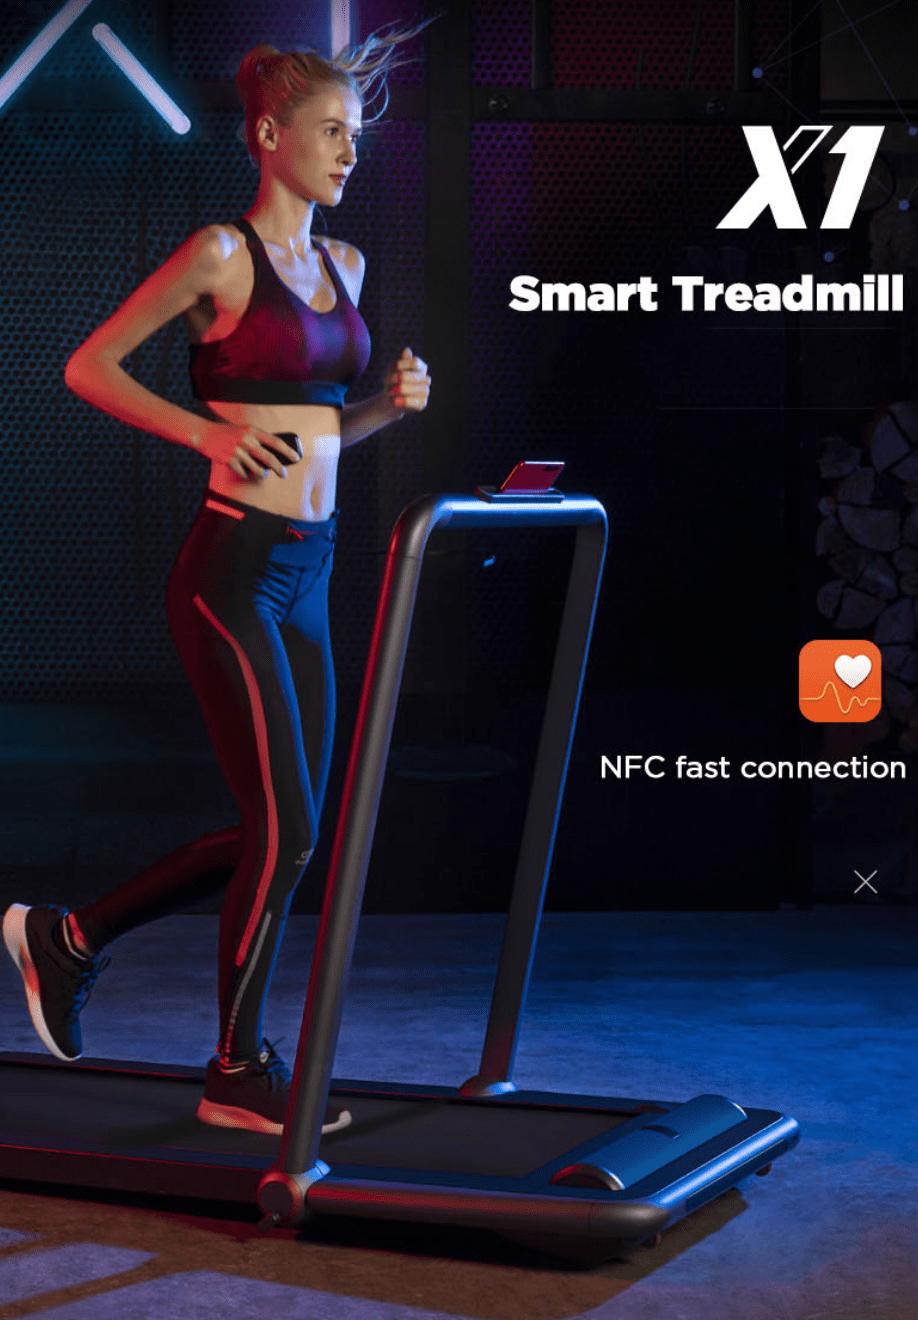 Huawei & Gymnastika X1 Treadmill 2 in 1 Smart APP Foot Step Speed Speed Folding Walking Walking Machine